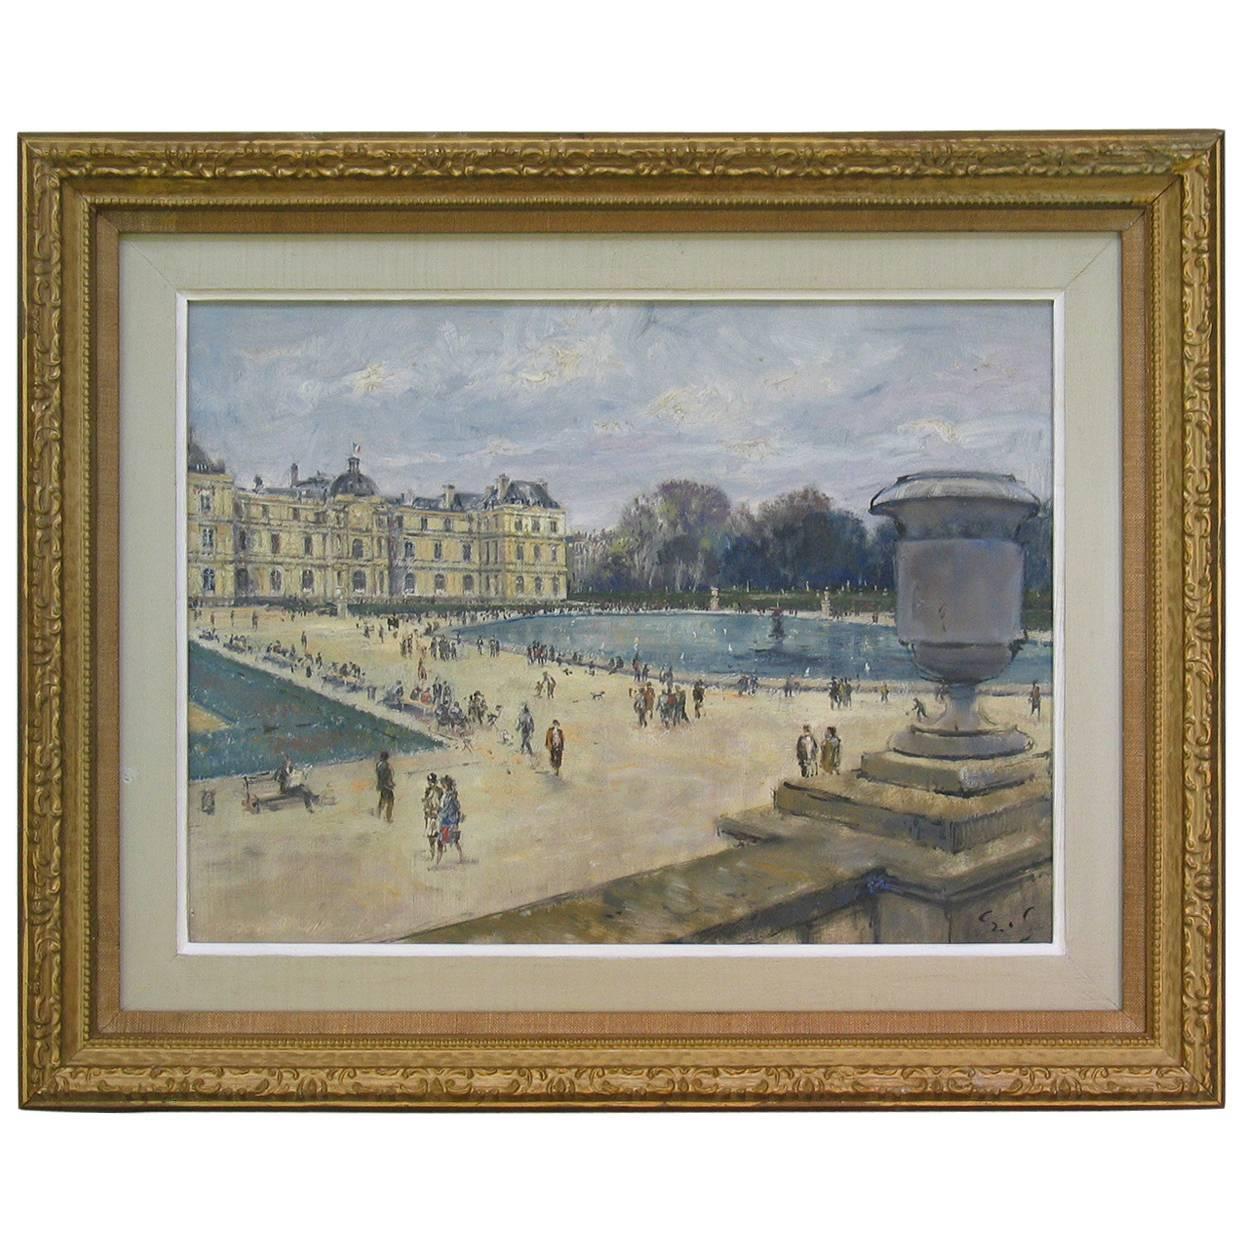 Impressionistic Style Painting of Le Jardin des Tuileries, Paris, France